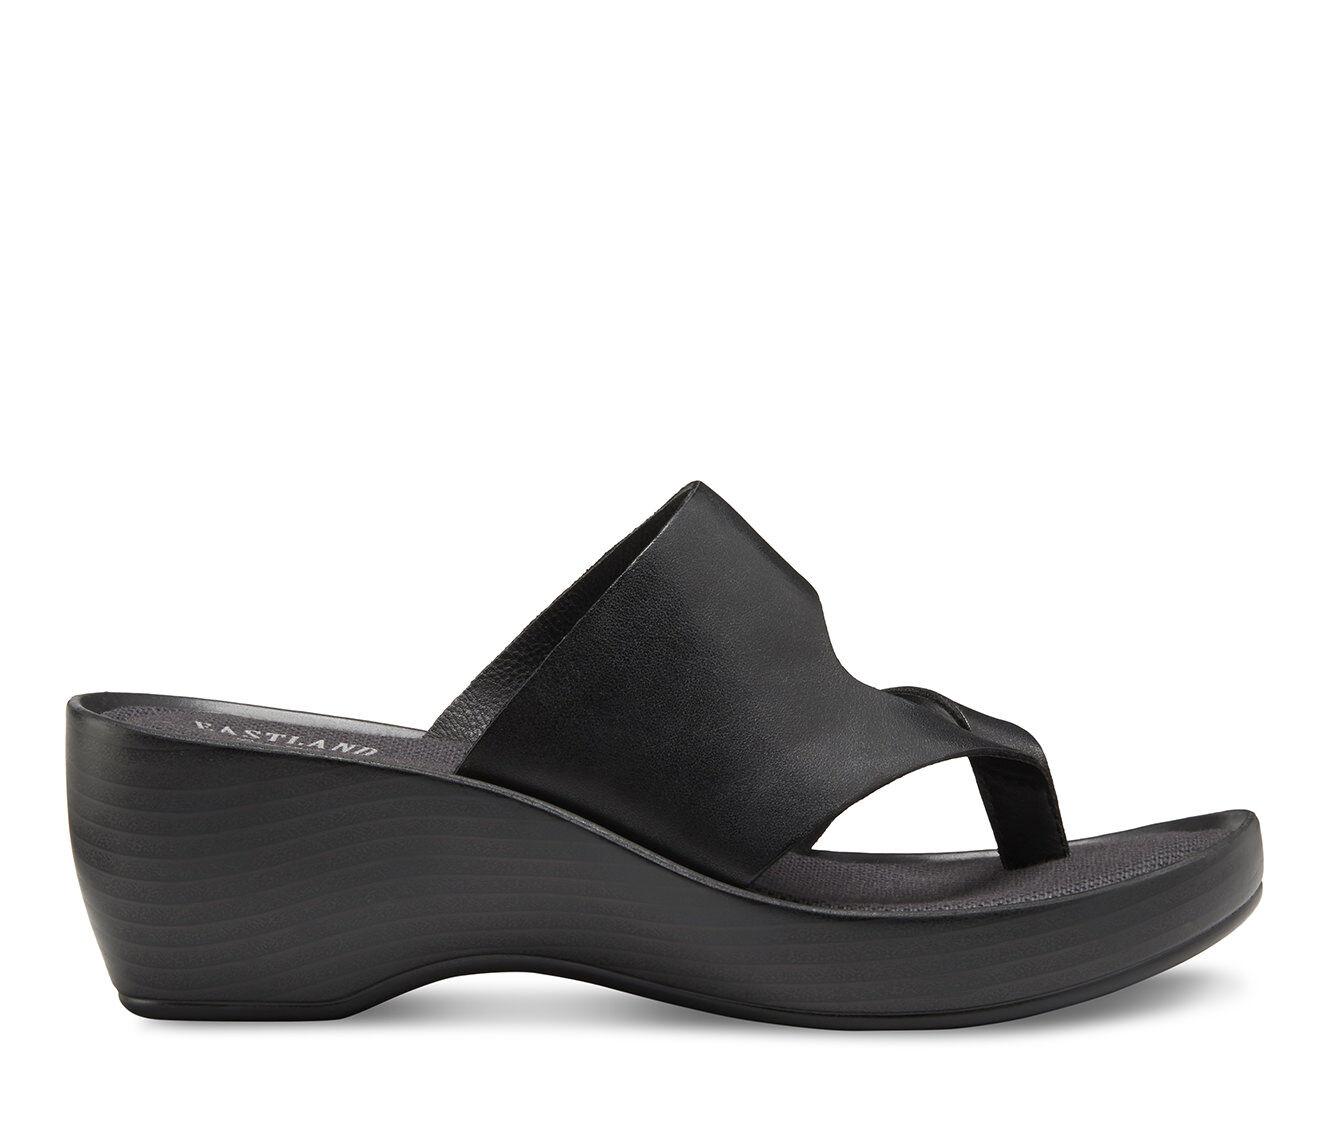 Women's Eastland Laurel Sandals Black